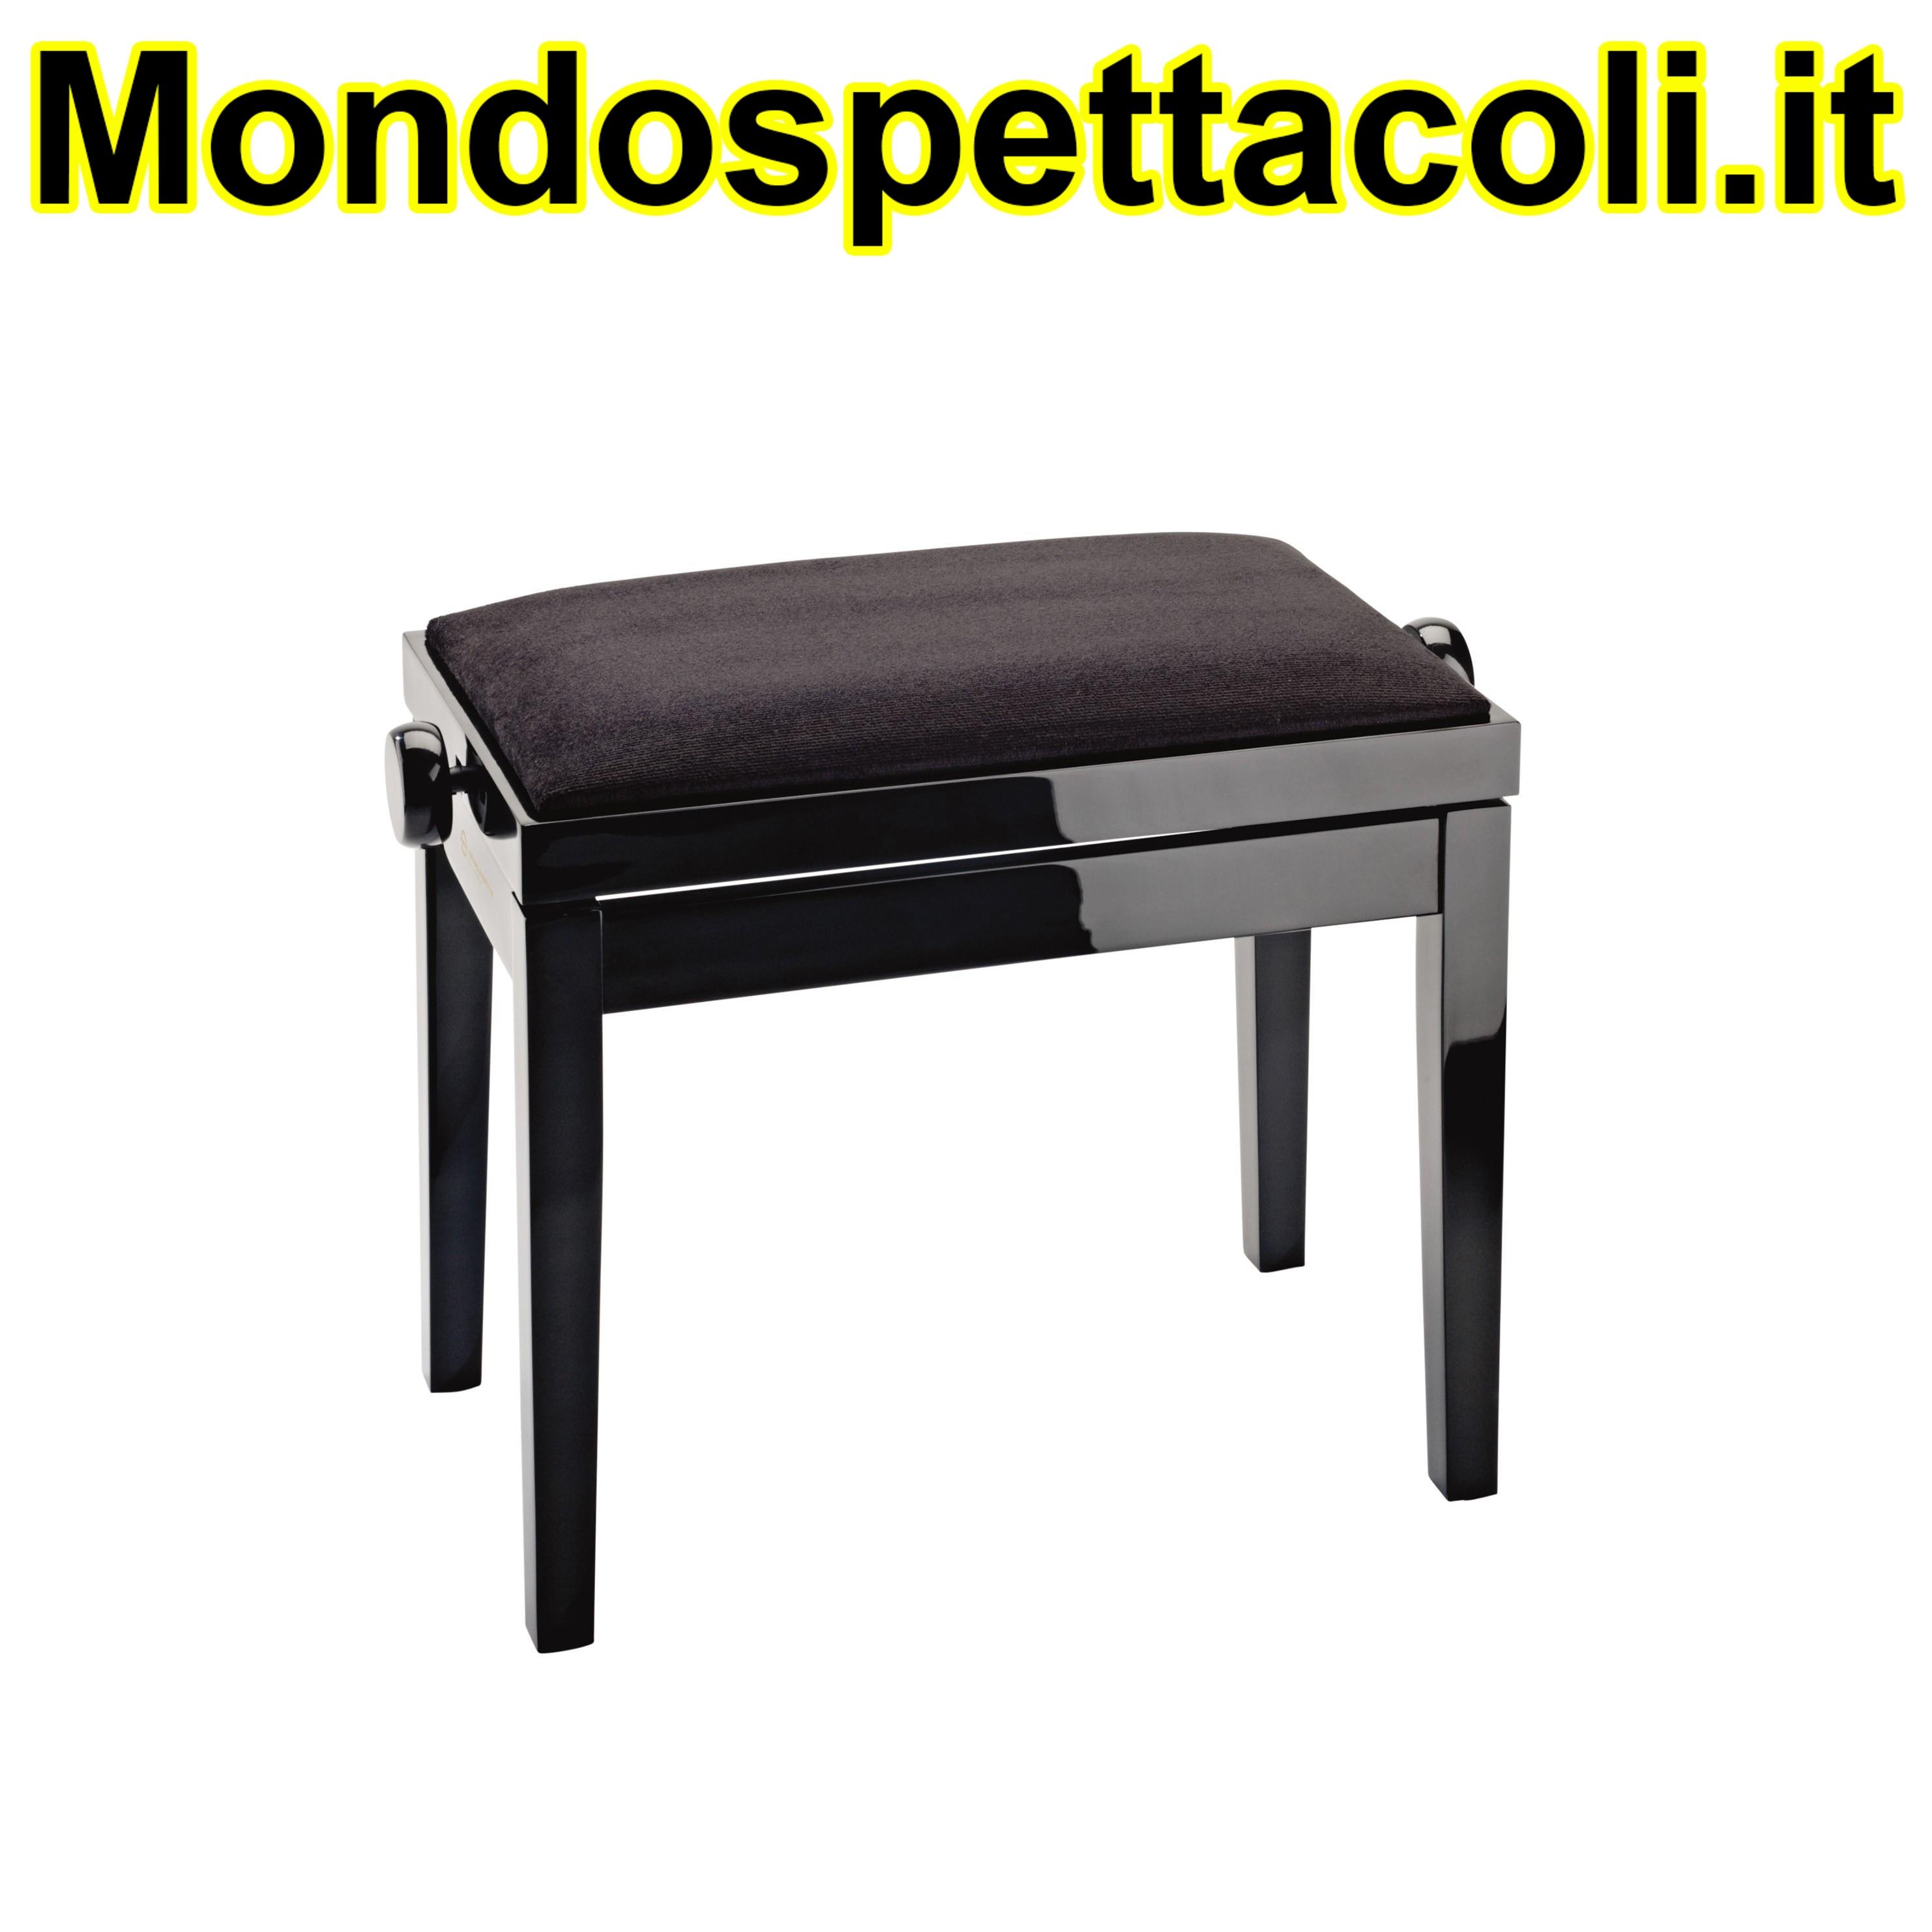 K&M bench black glossy finish, seat black velvet Piano bench 13901-100-21